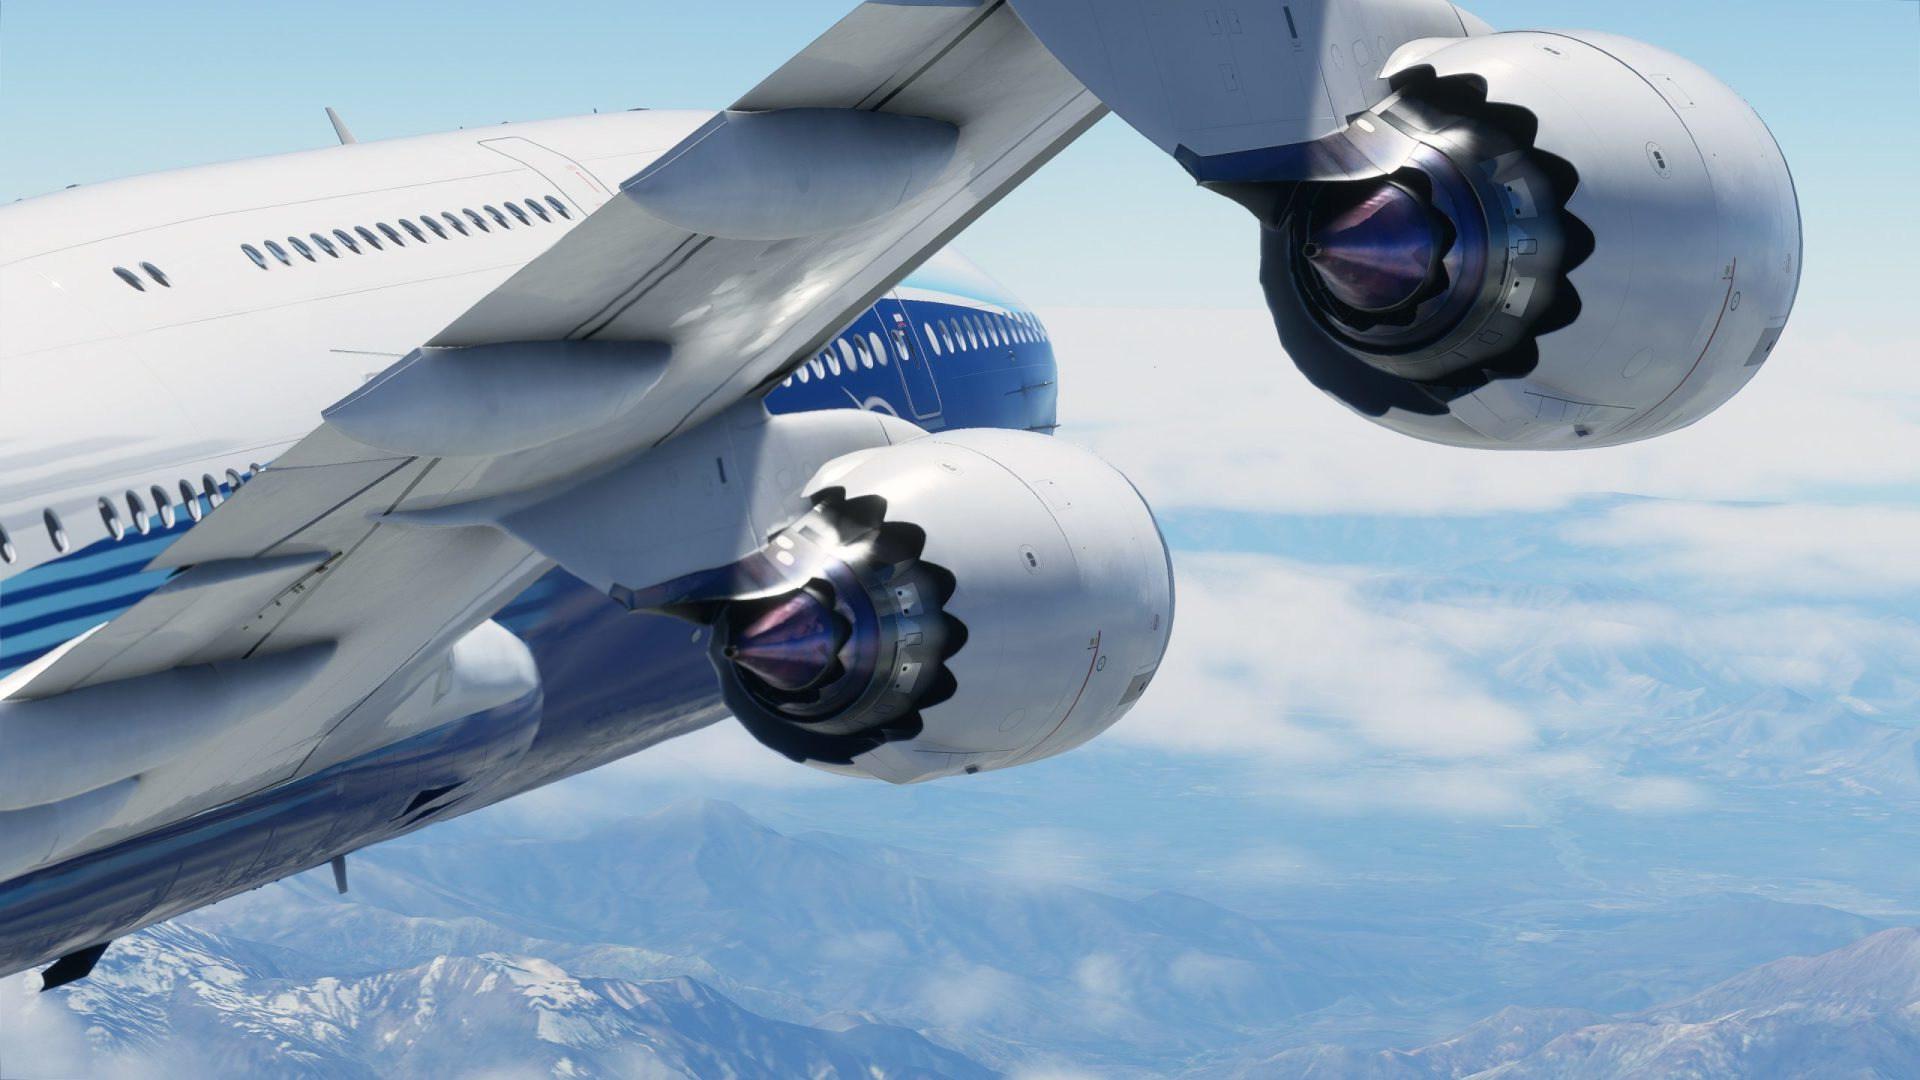 Microsoft, Gaming, Spiele, Games, Flugzeug, flugsimulation, Screenshots, Flight Simulator 2020, Turbine, Boeing 747-8i